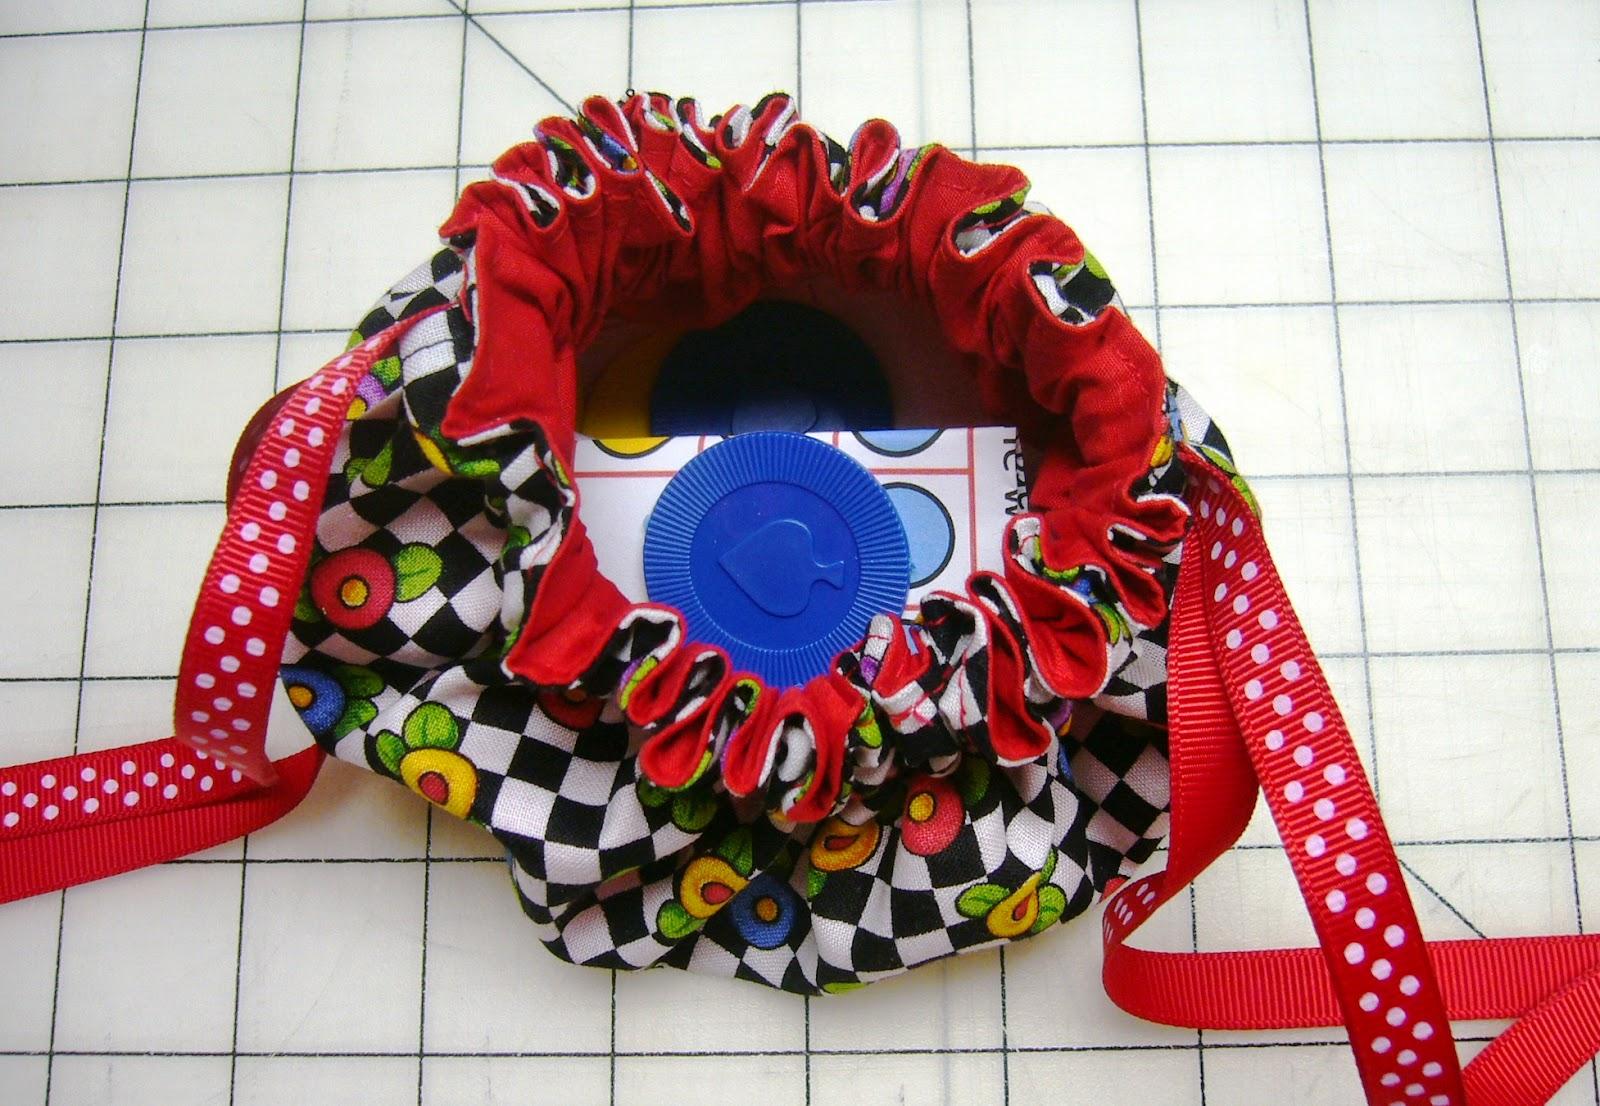 Traveling Tic Tac Toe Game with Drawstring Bag DIY